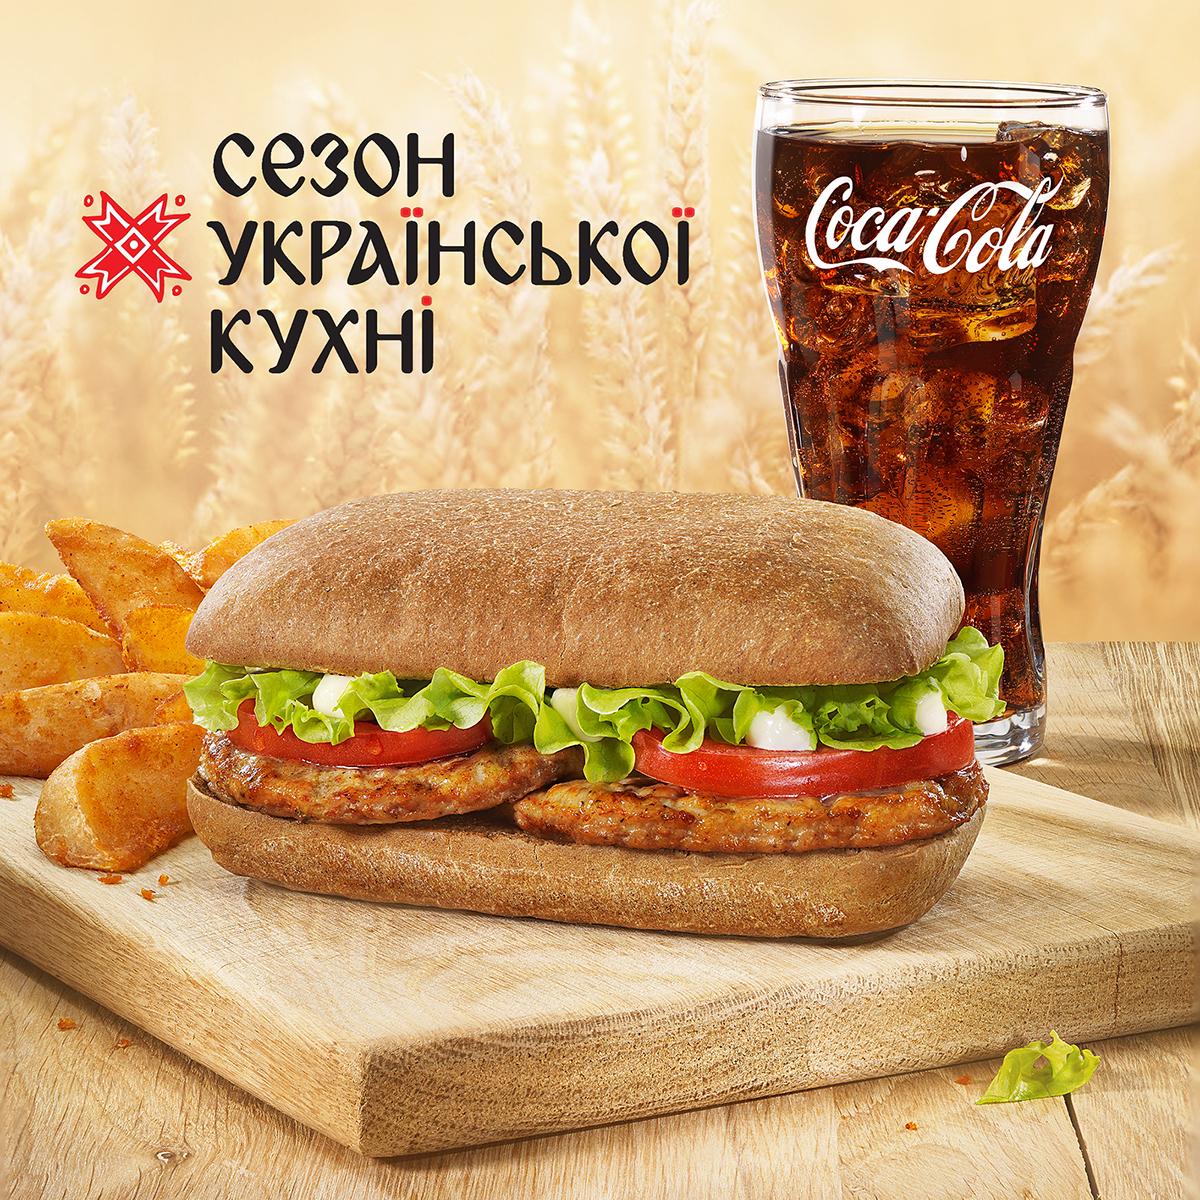 mcdonald's,potproduction,ukraine,bigfishhouse